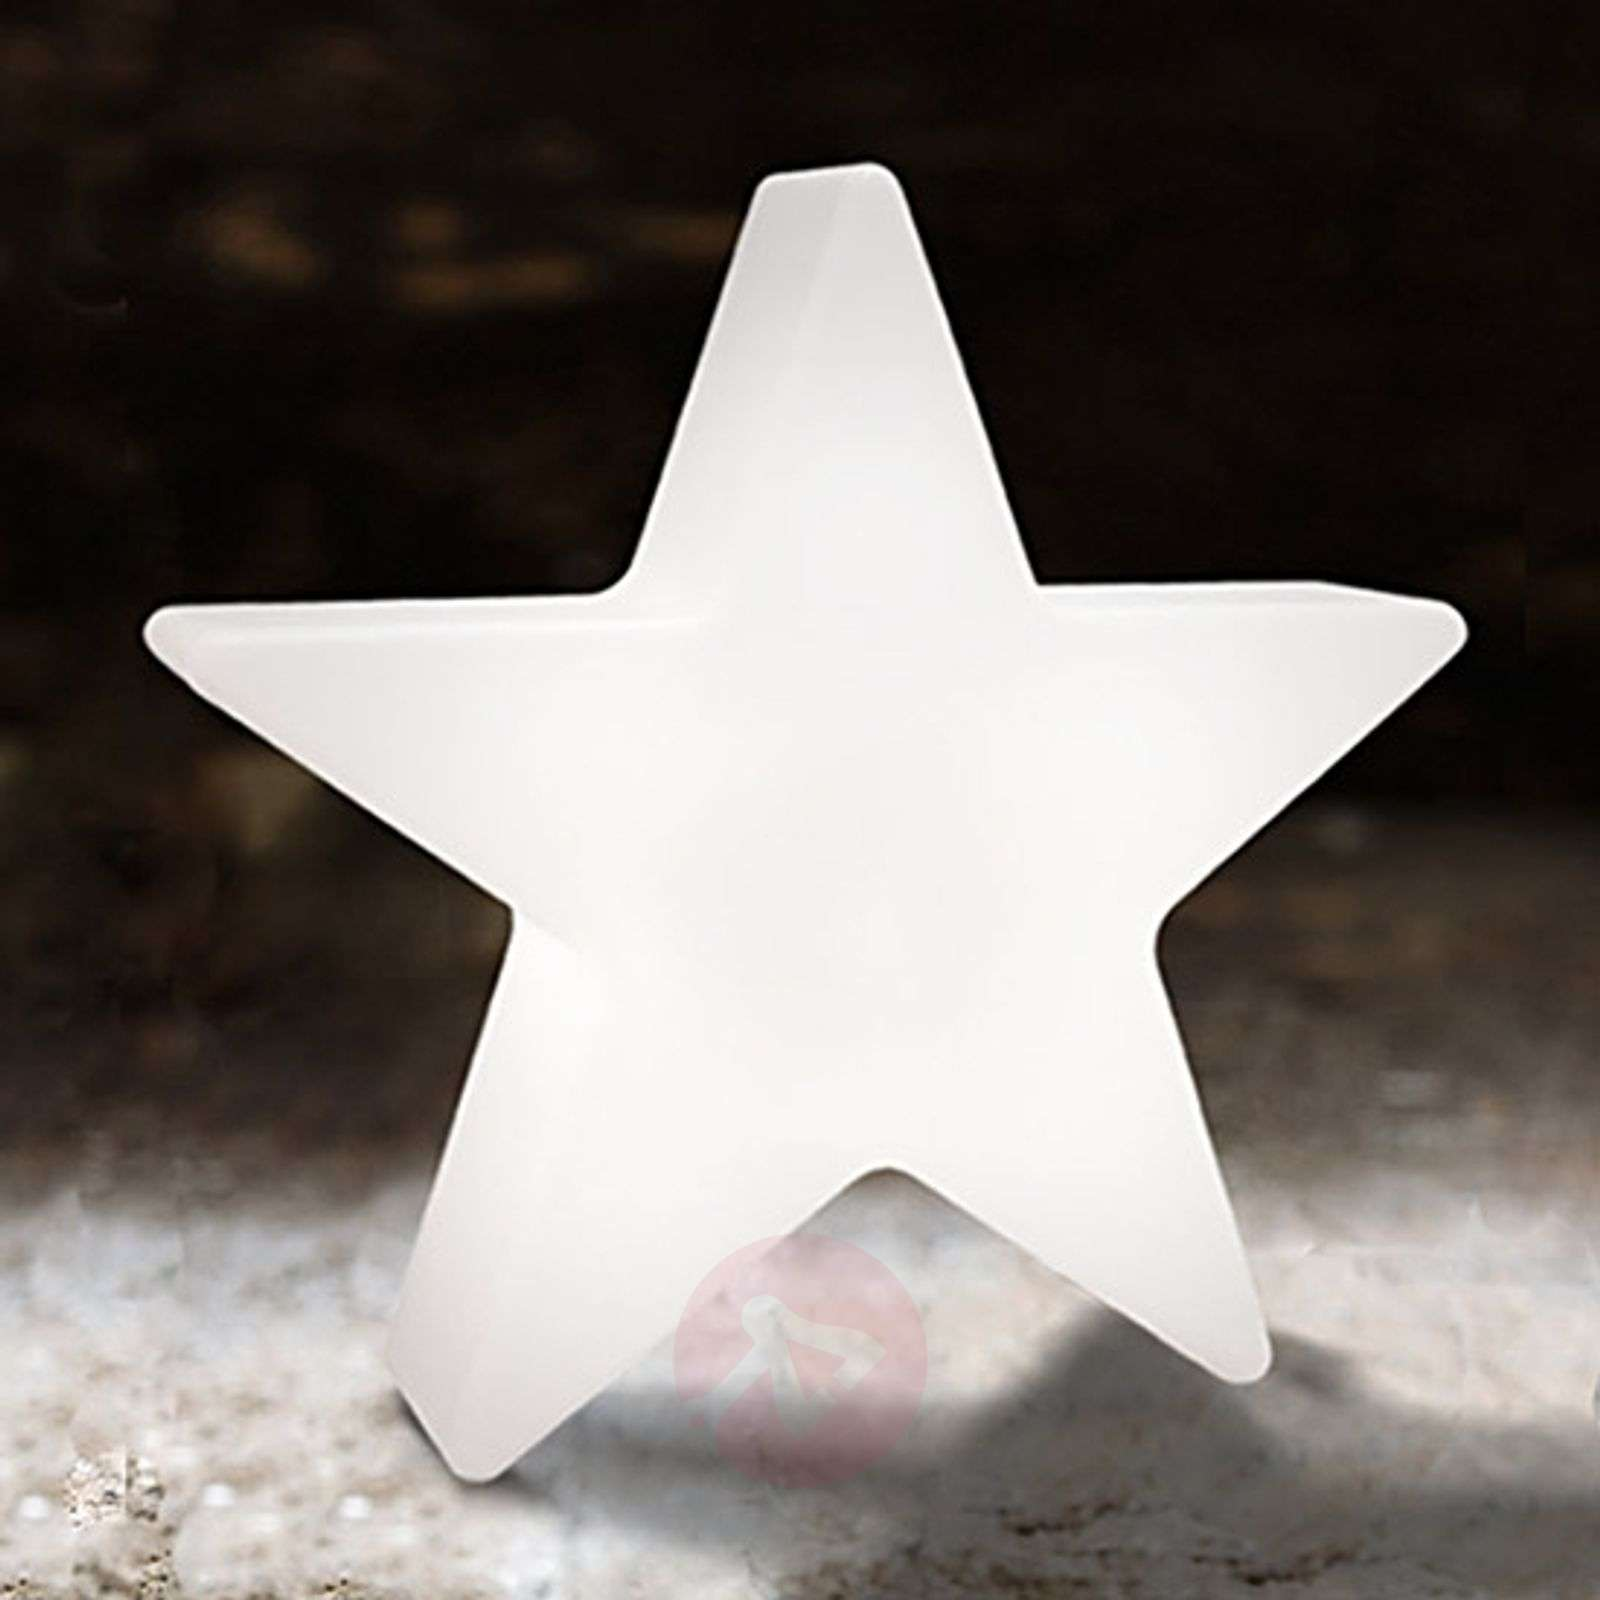 LED decorative light Shining Star Micro 11 cm-1004050-01